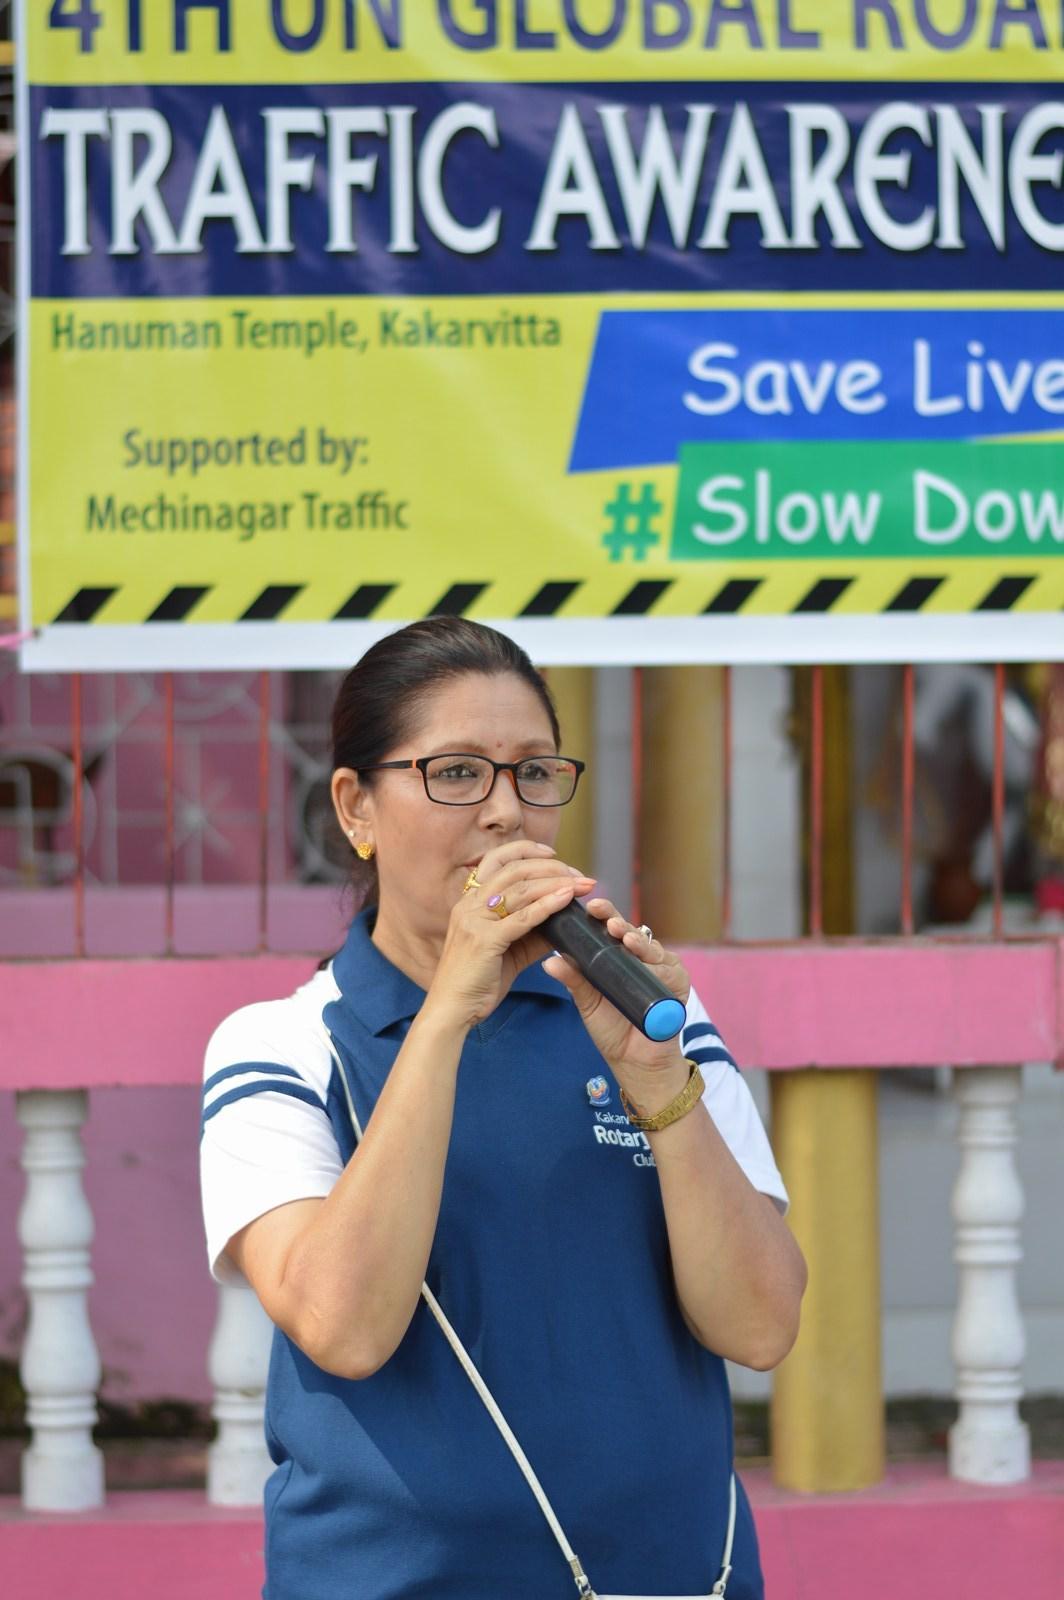 4th-UN-Global-Road-Safety-Week-2017-Traffic-Awareness-Program-Rotary-club-of-Kakarvitta-34